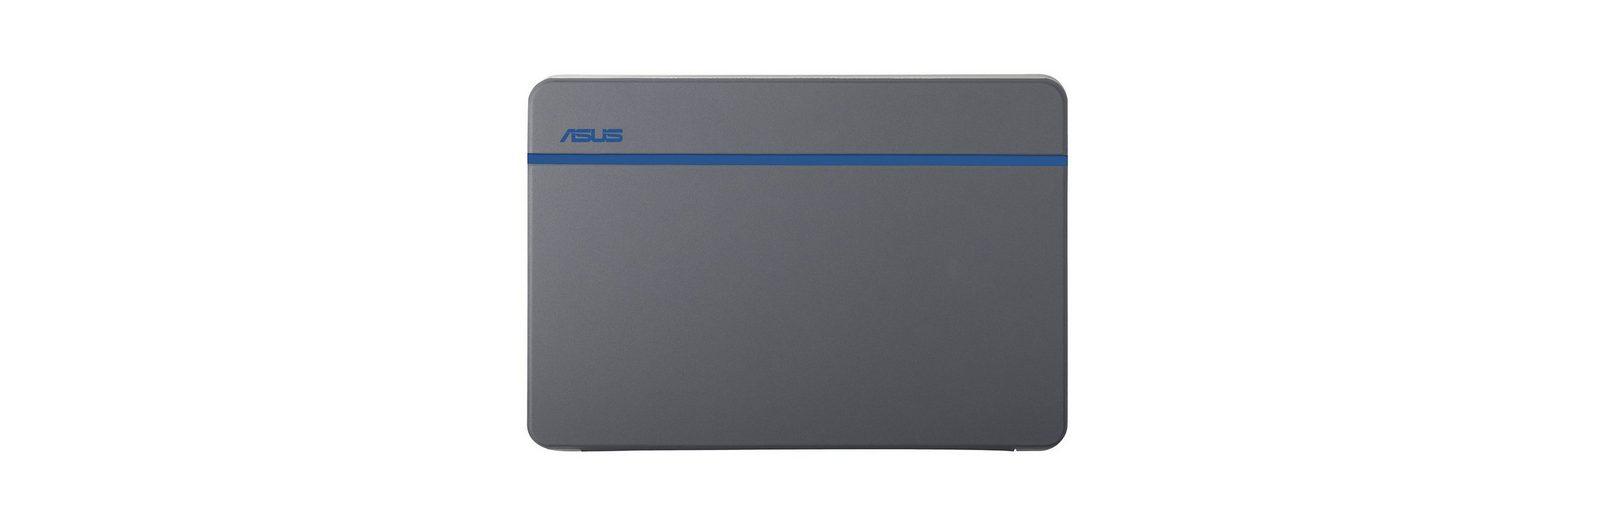 ASUS Tablet Schutzhülle »MagSmart Cover blau für TF303 (90XB015A-BSL020)«